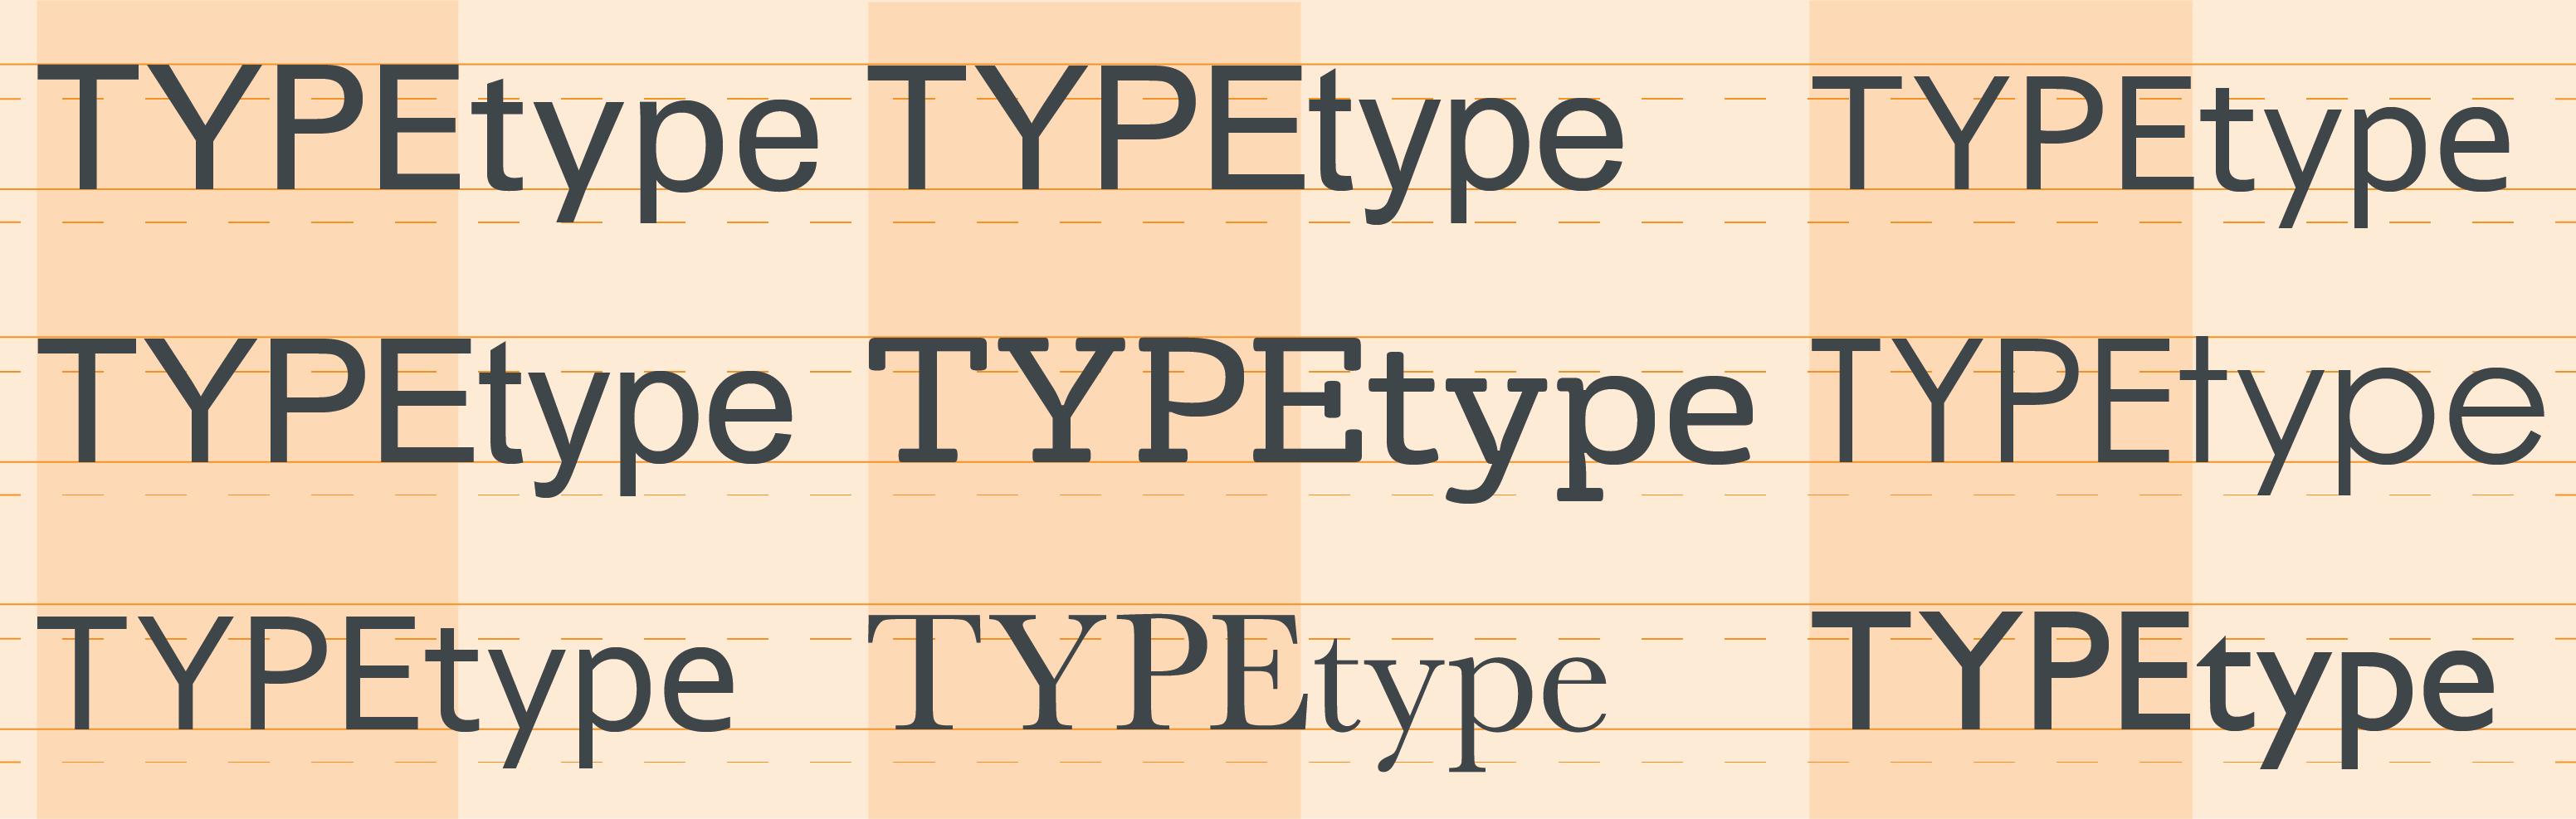 Type size comparison